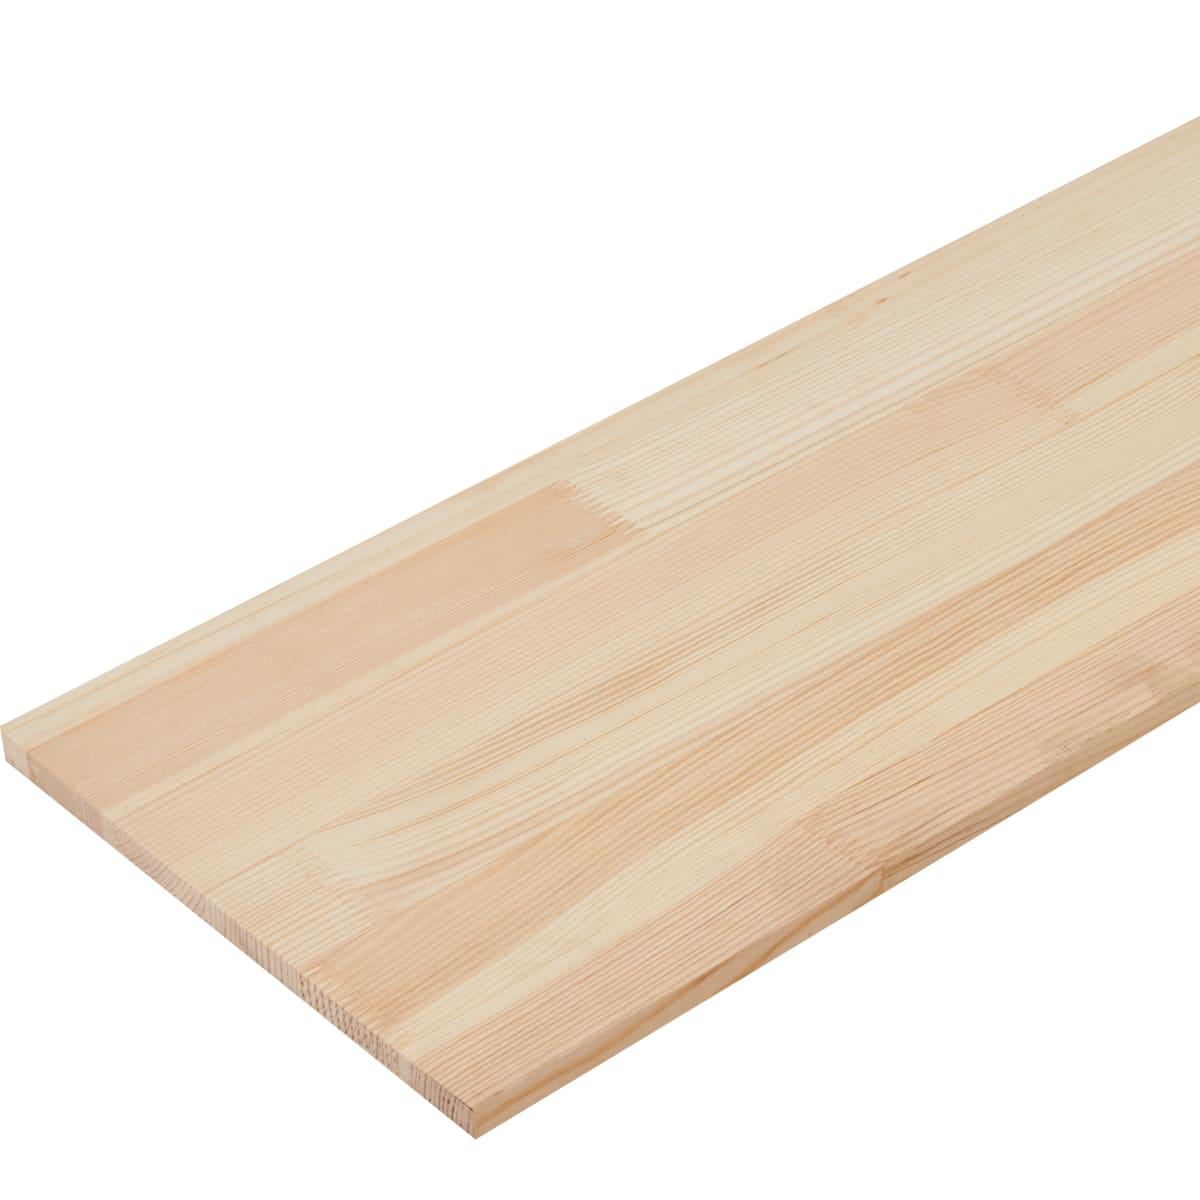 Панель деревянная экстра 11х200х3000 мм